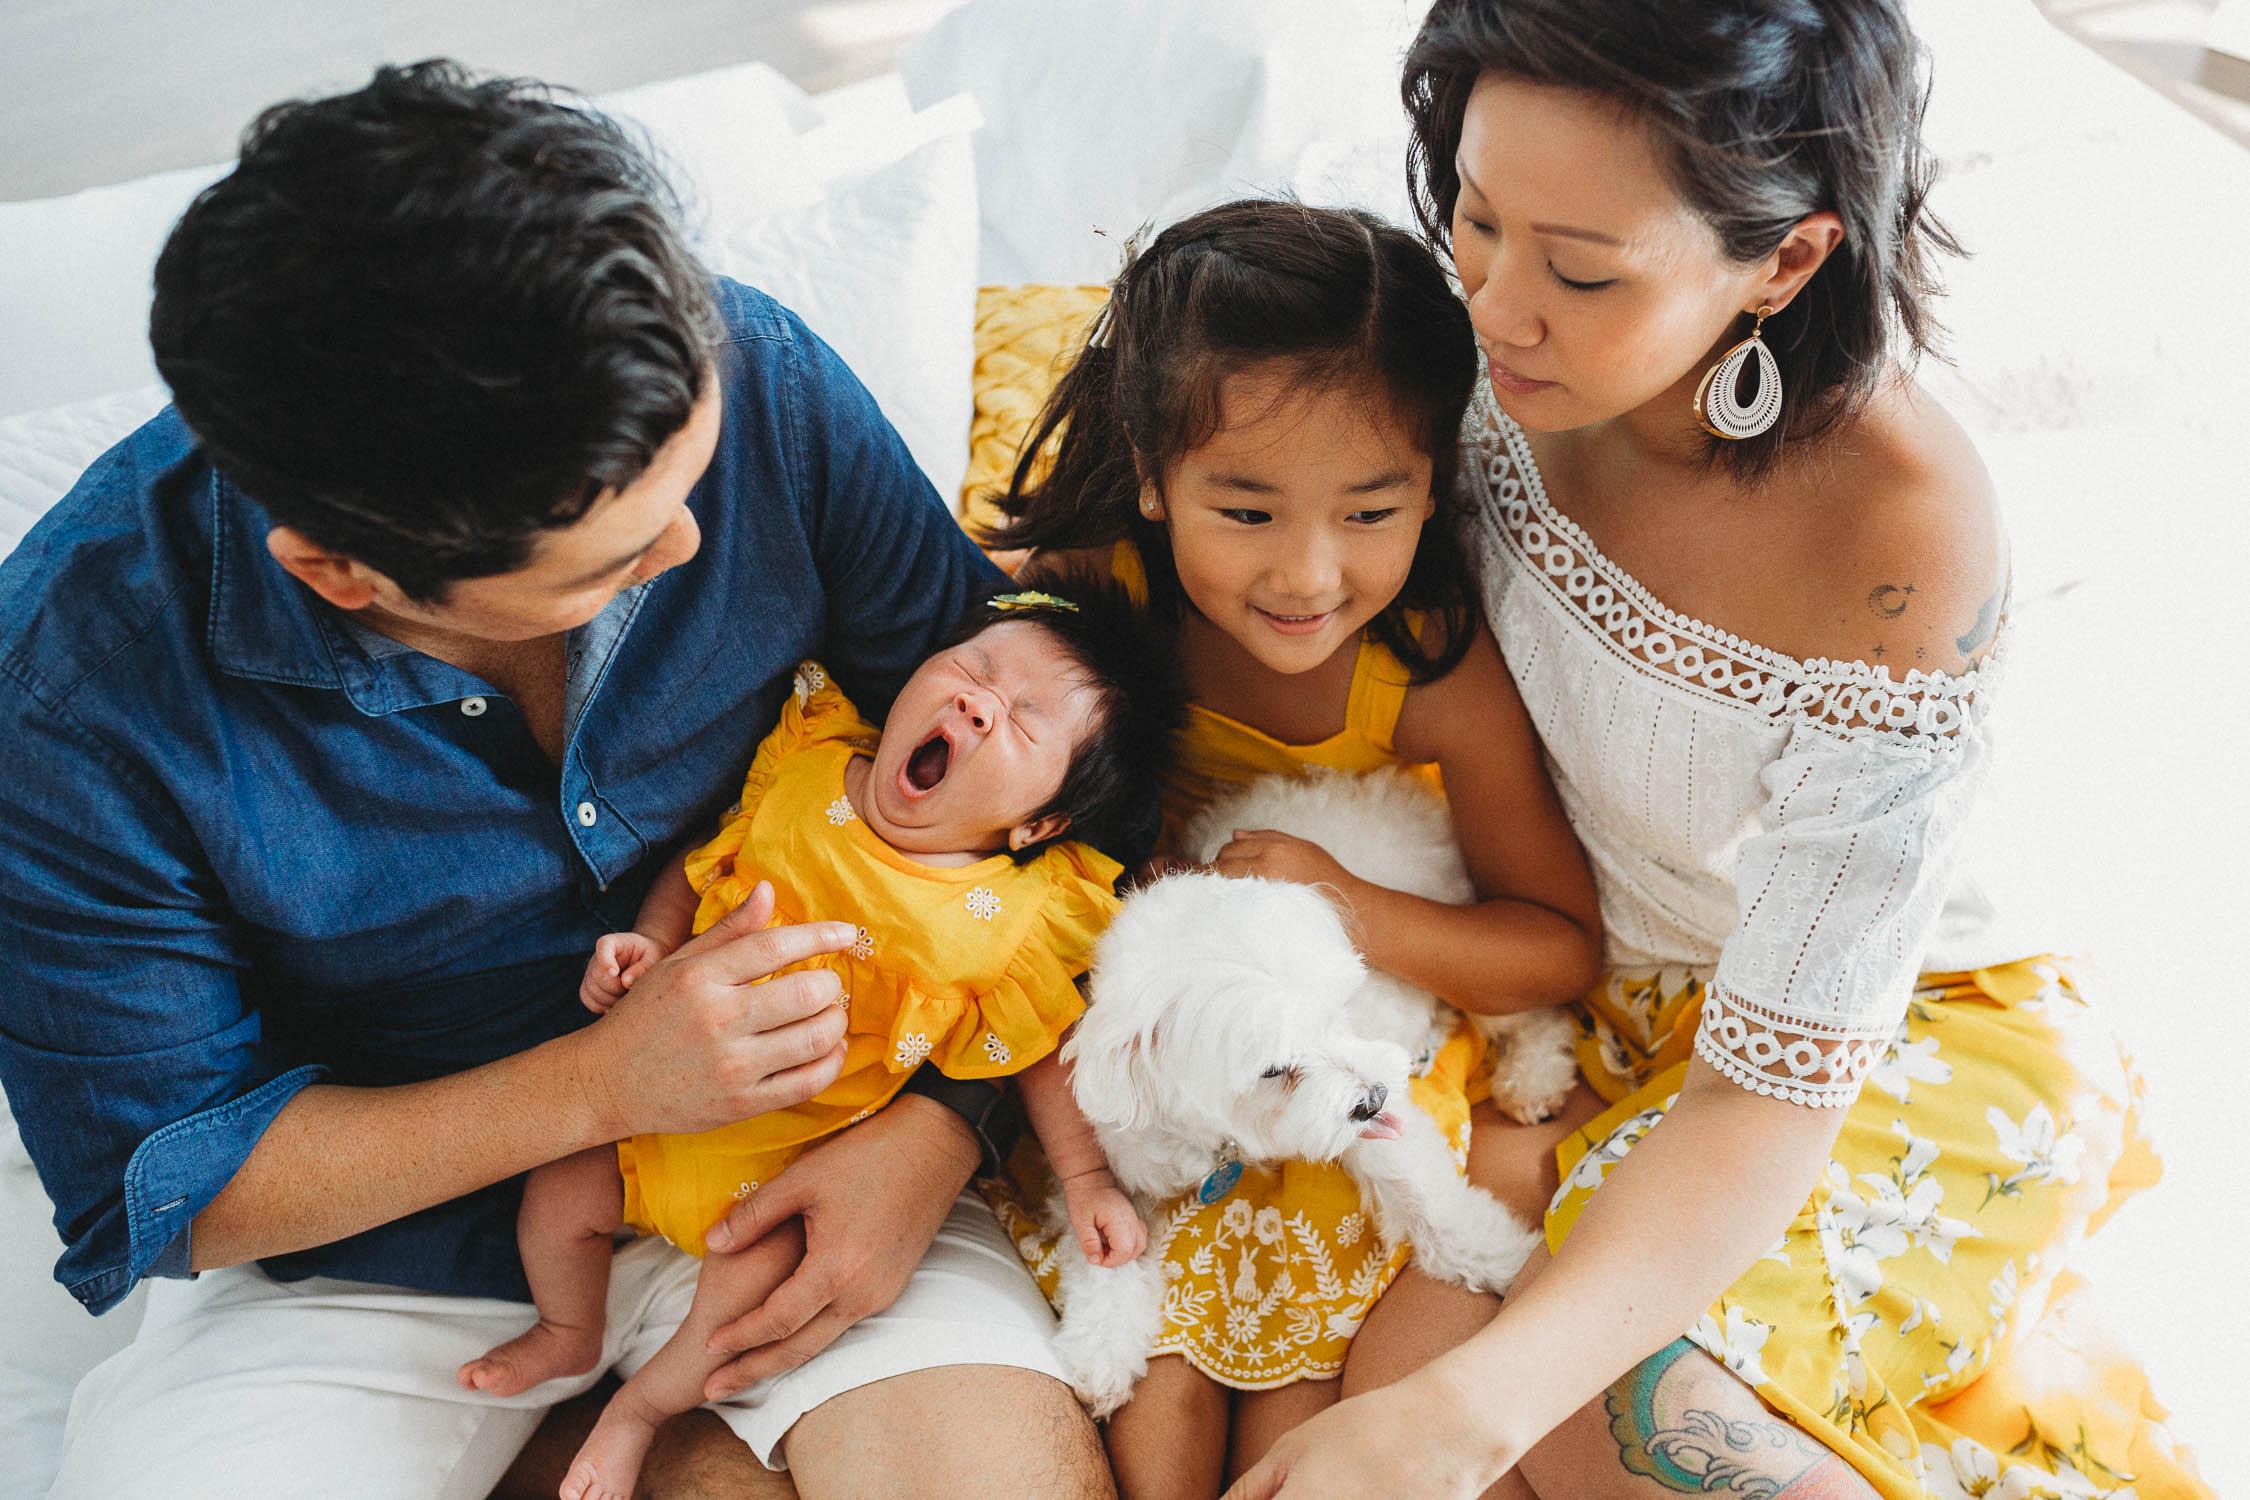 julia_whale_photography_newbornphotography-20.jpg